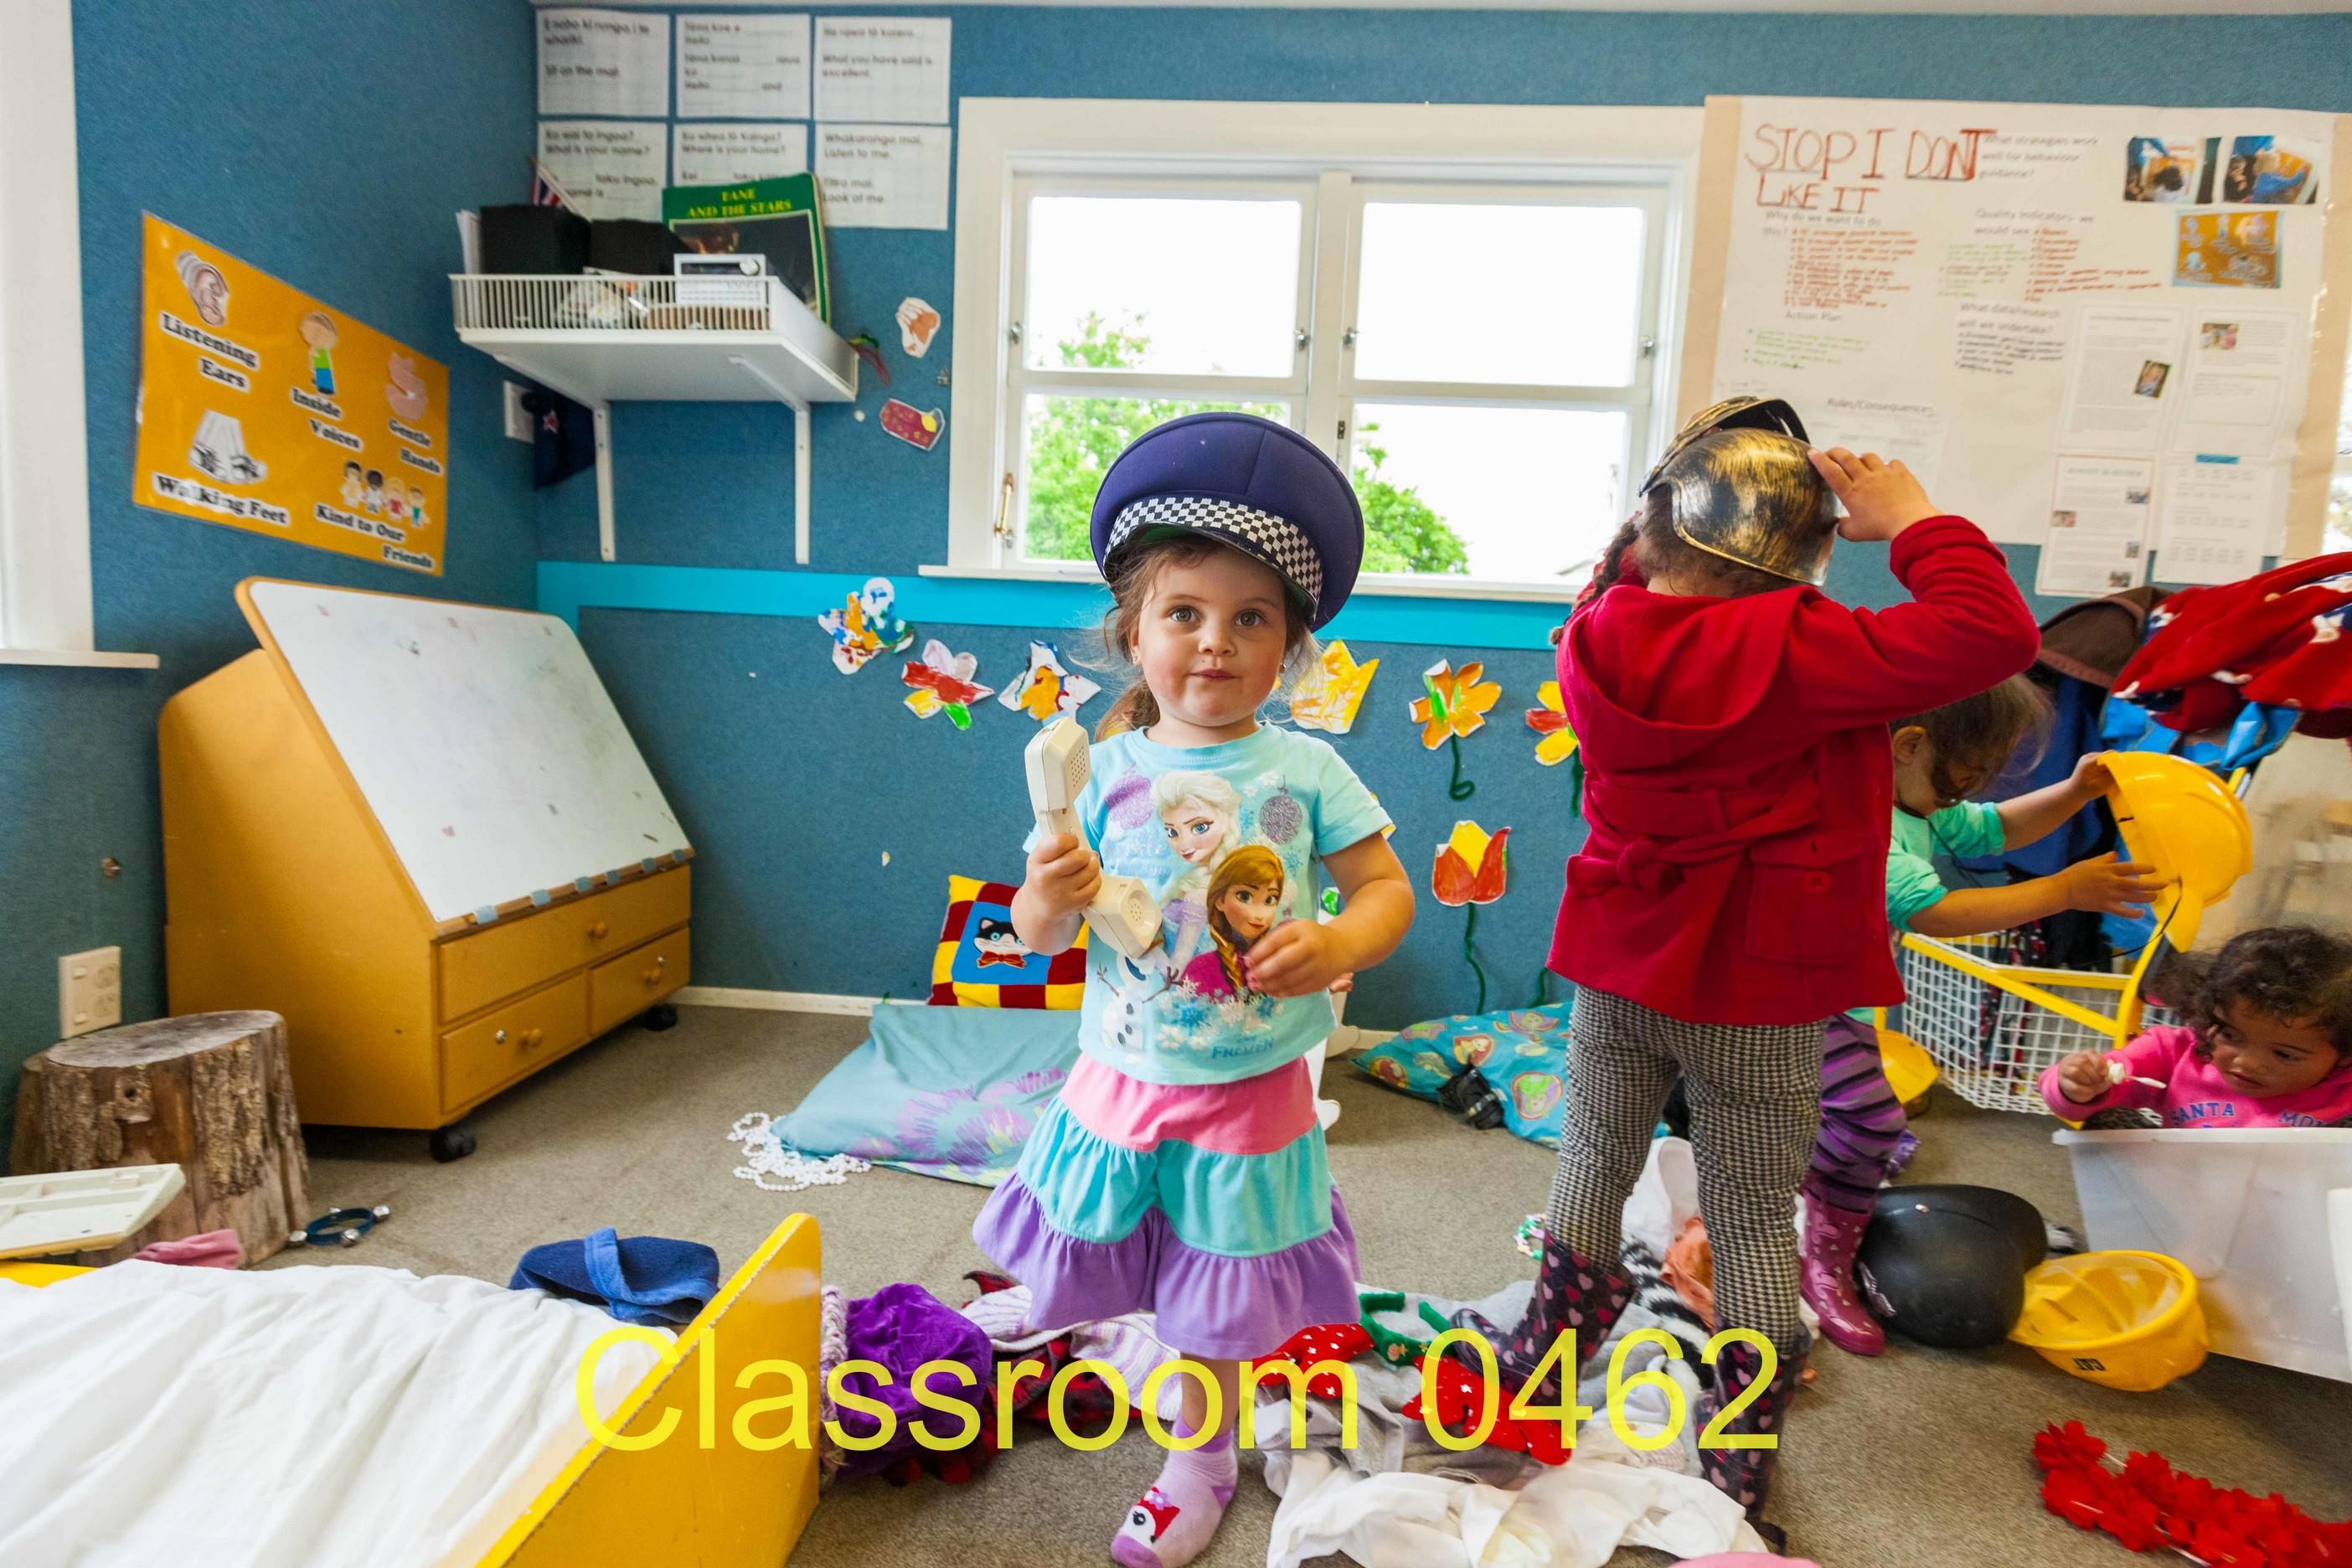 Classroom 0462